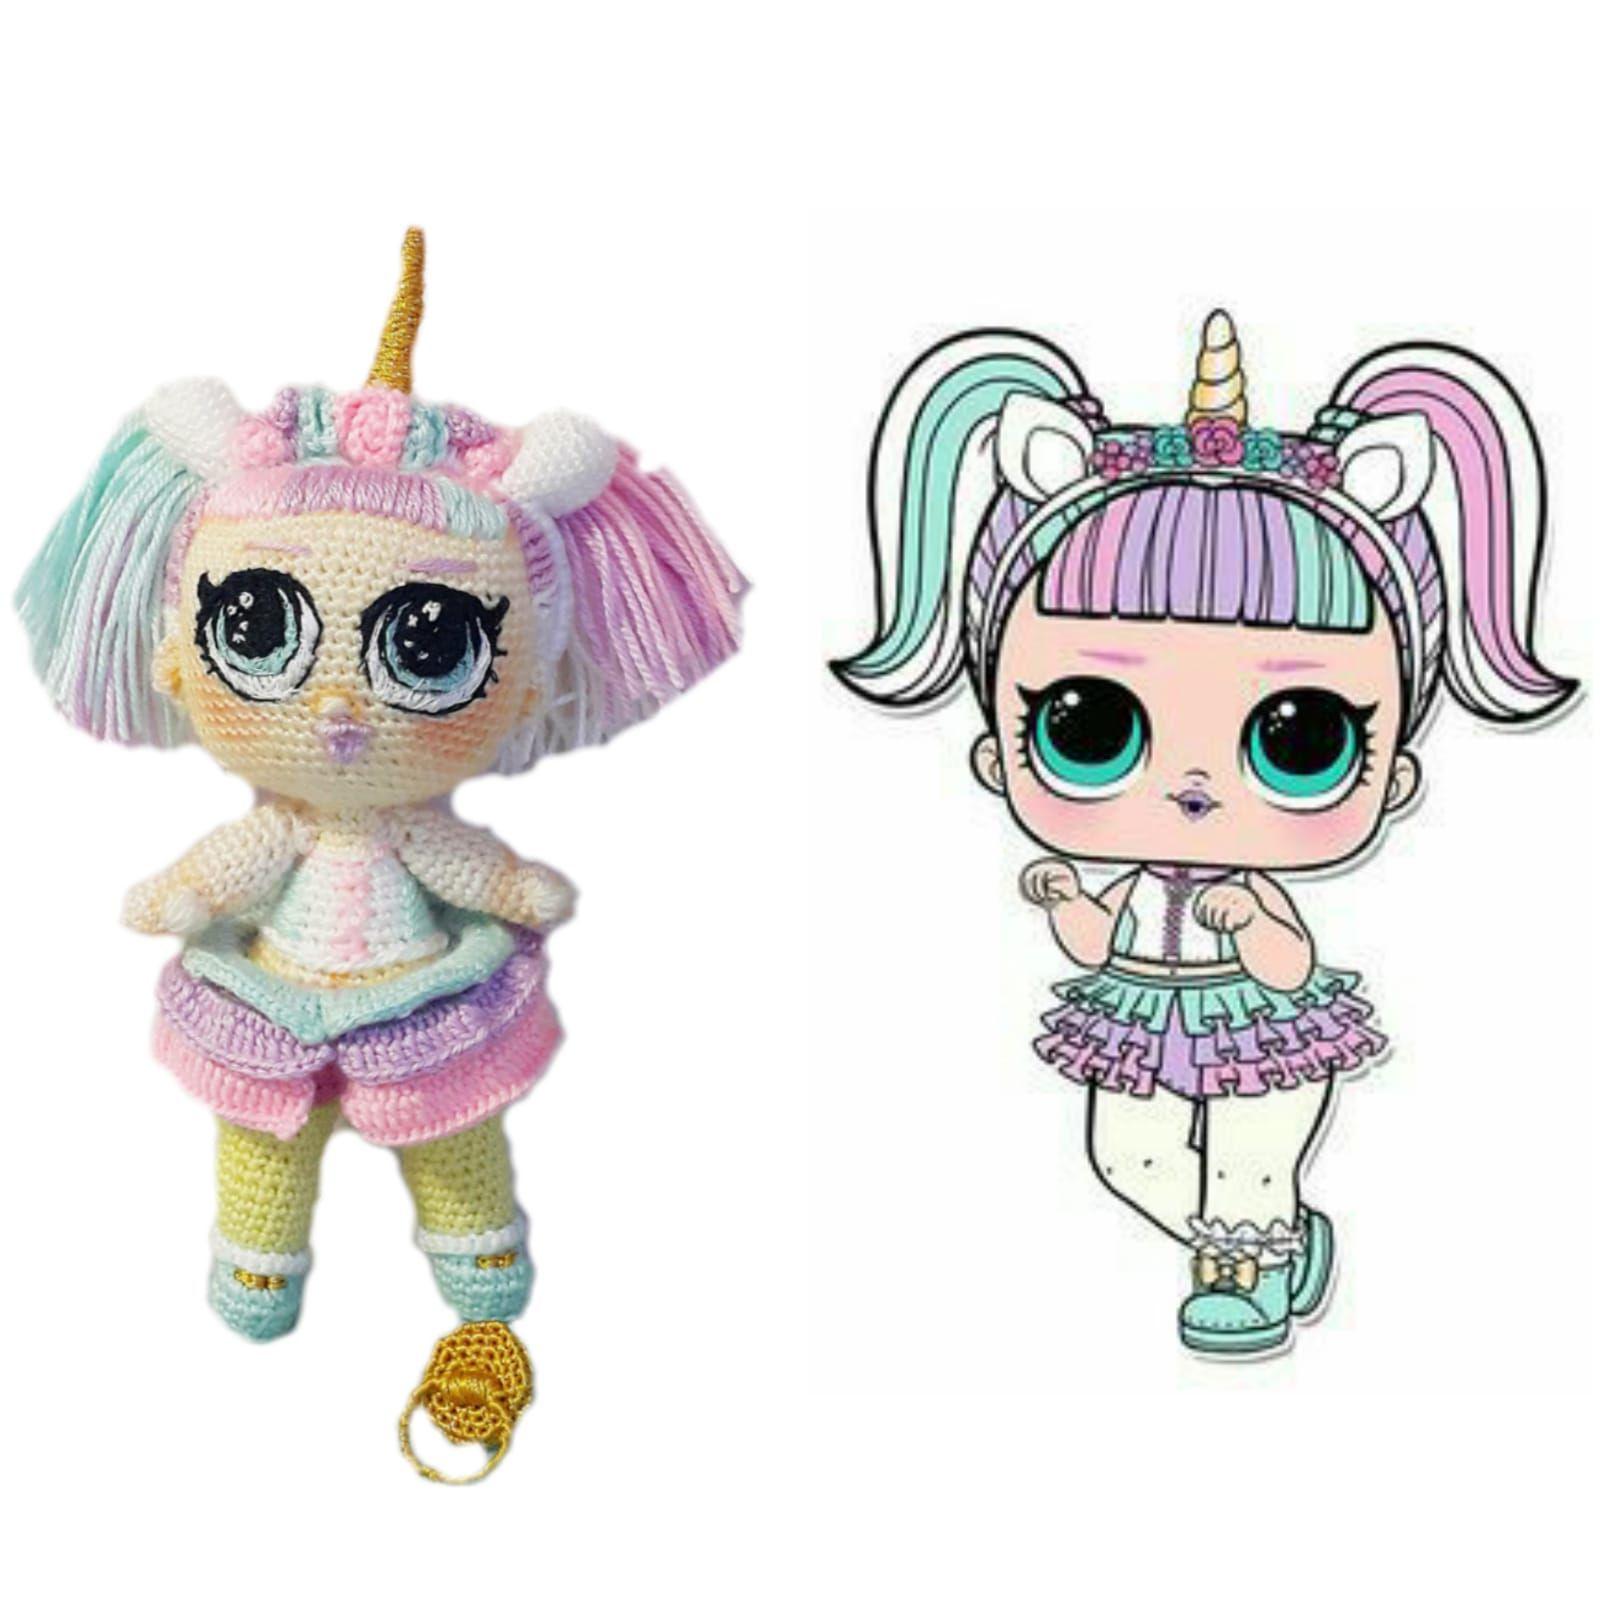 Lol Bebek Unicorn Amigurumi Organik Oyuncak N11 Com Lol Oyuncak 11 Nisan